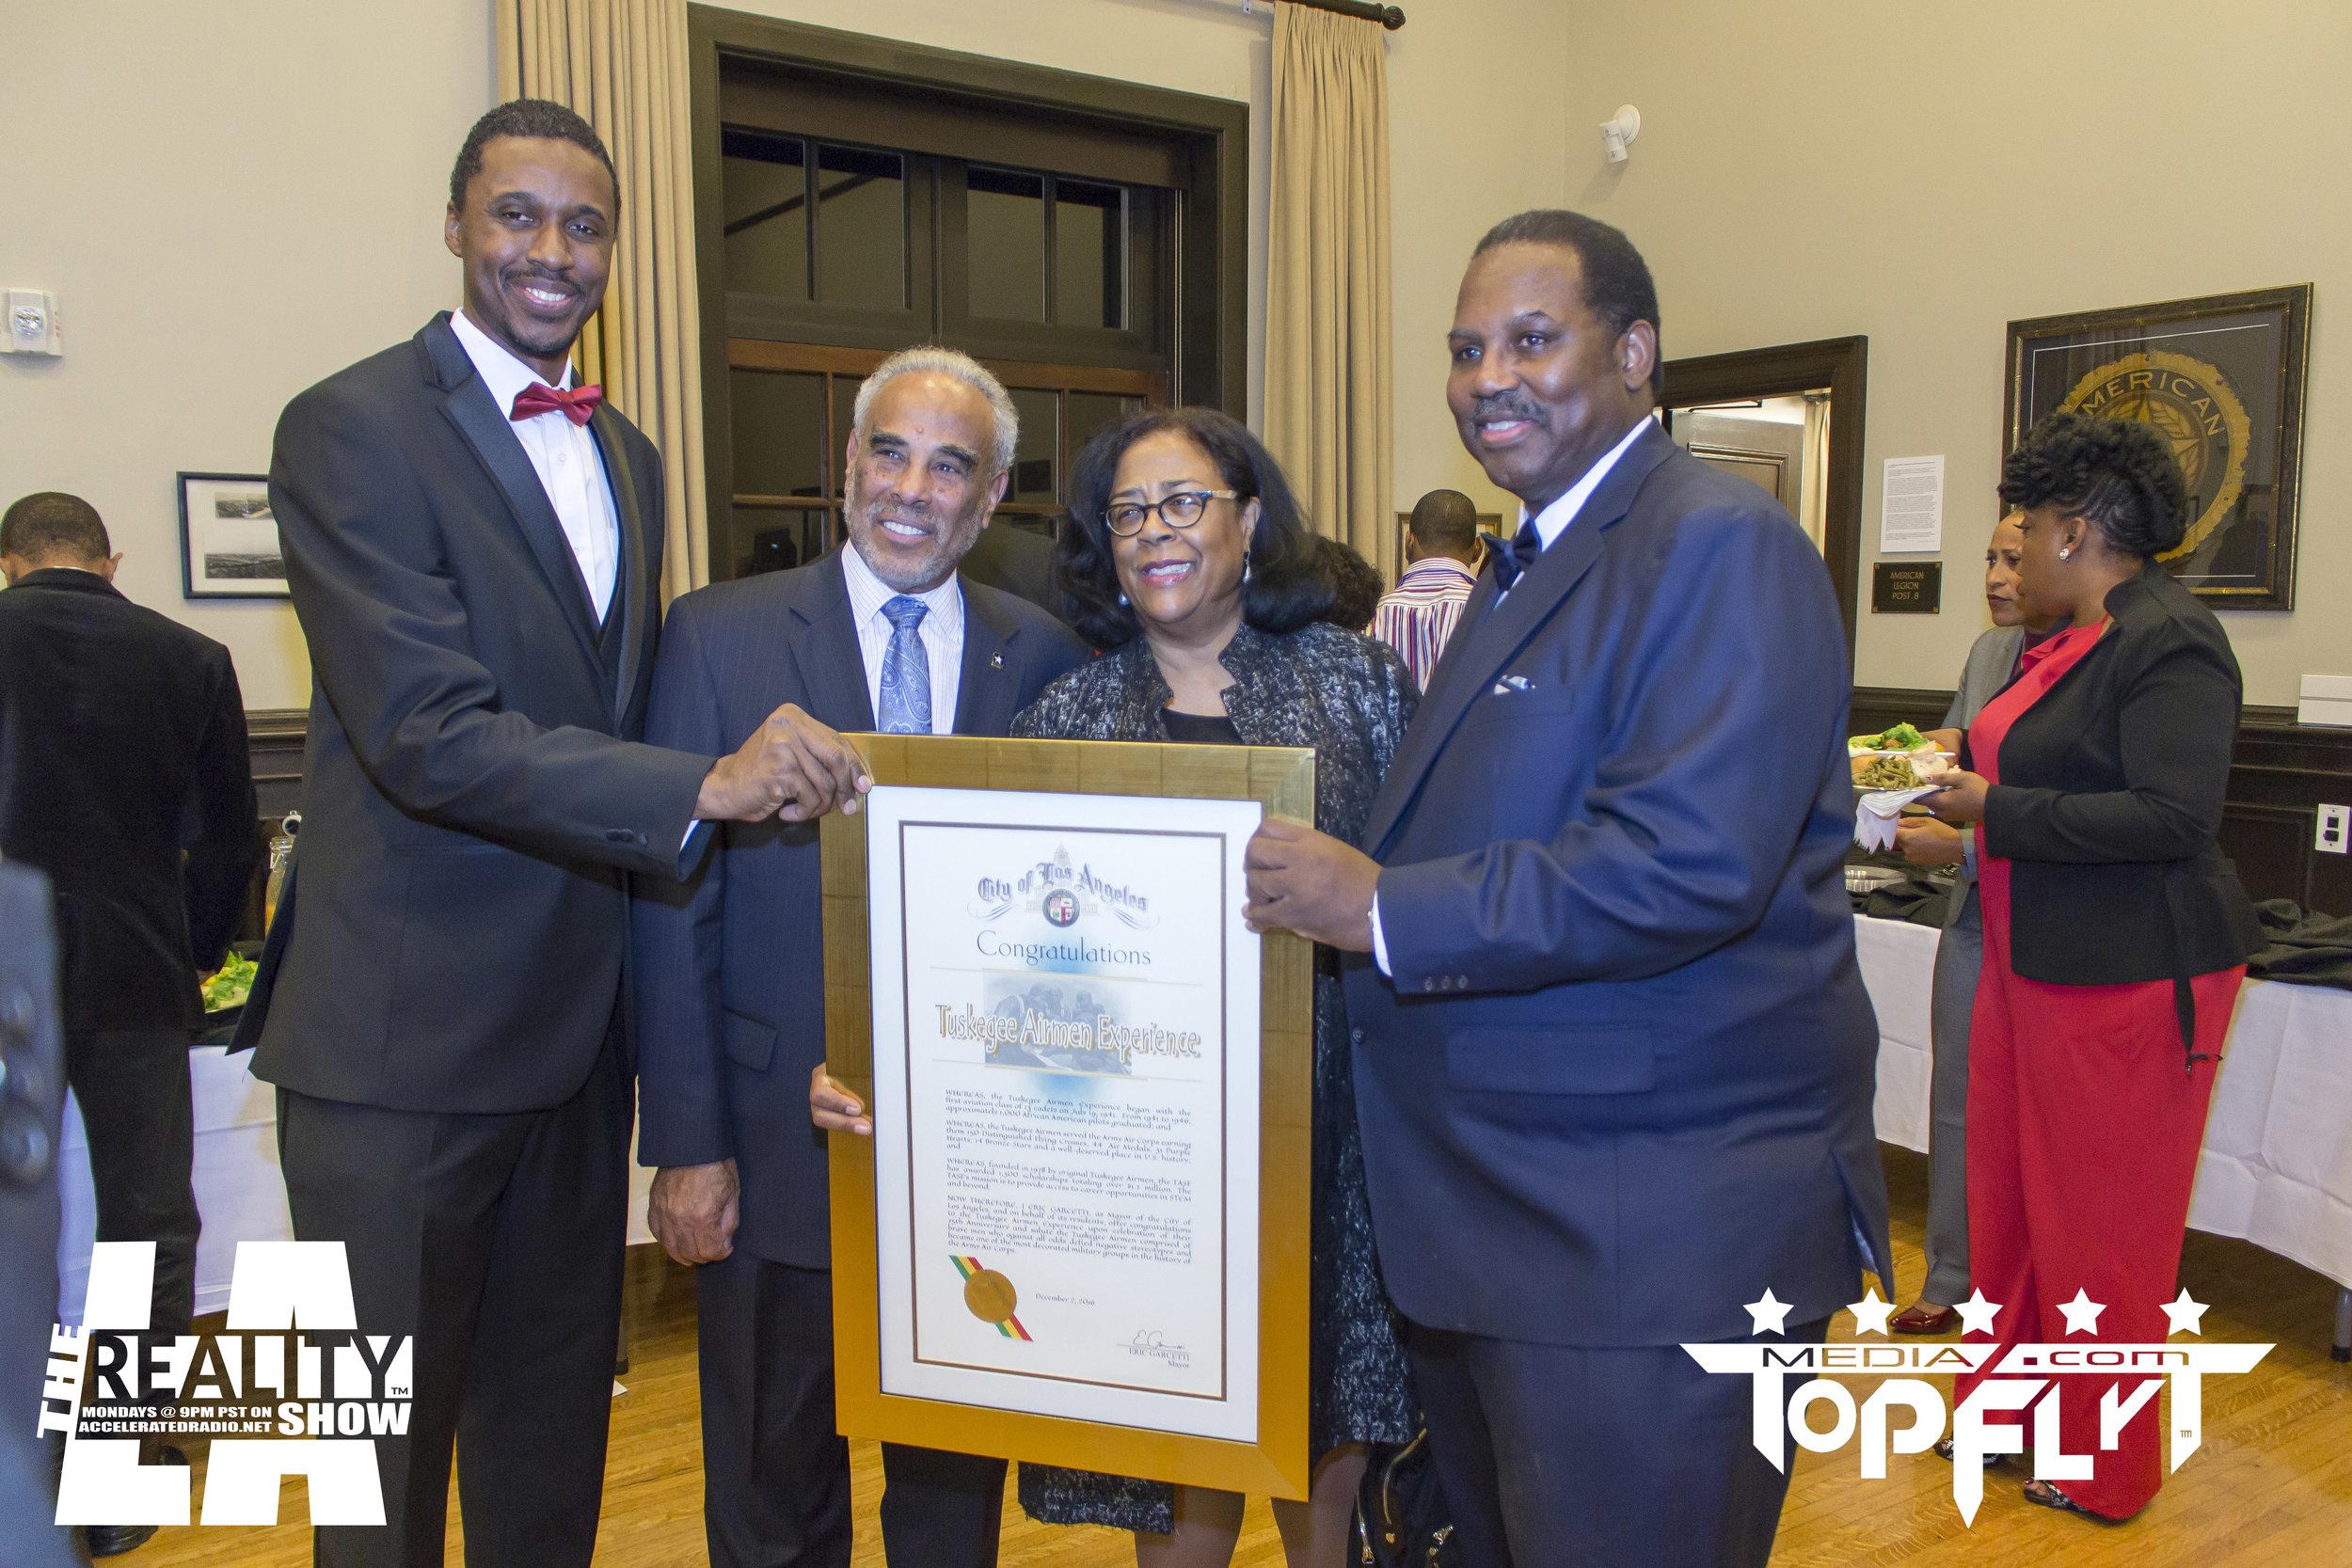 The Reality Show LA - Tuskegee Airmen 75th Anniversary VIP Reception_119.jpg